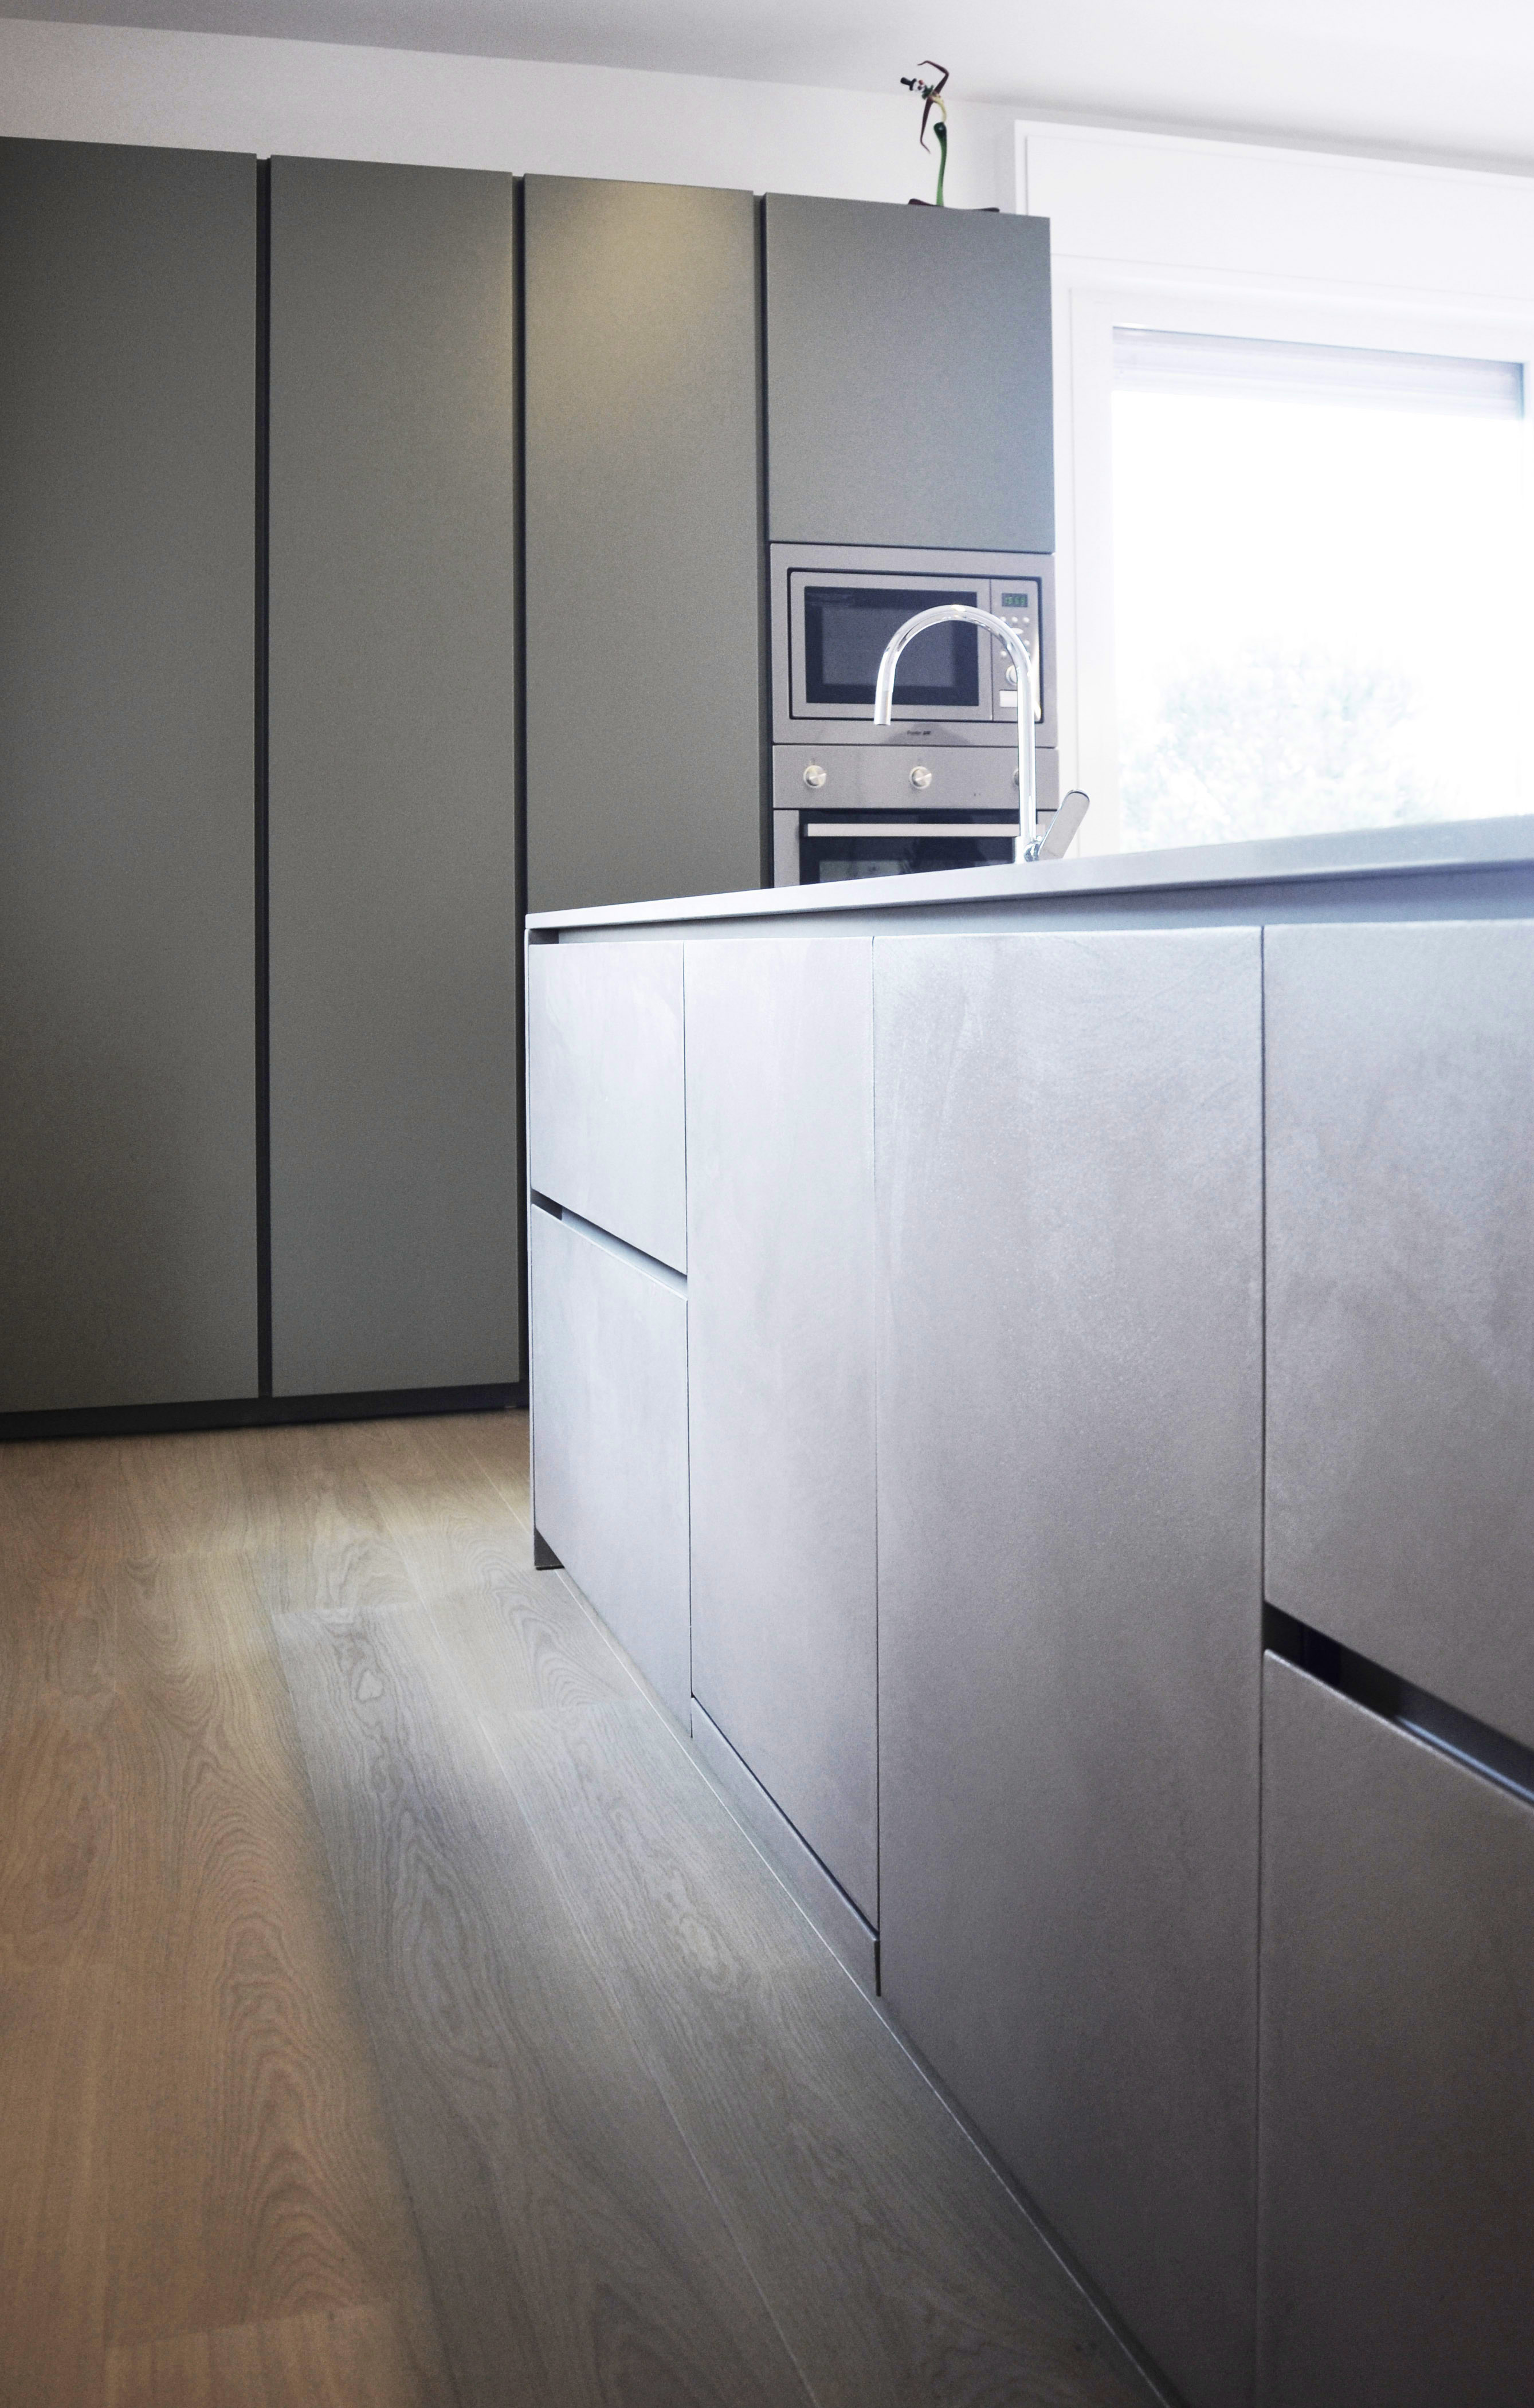 casa SP. isola cucina firmata stosa cucine. microcemento e colori naturali.